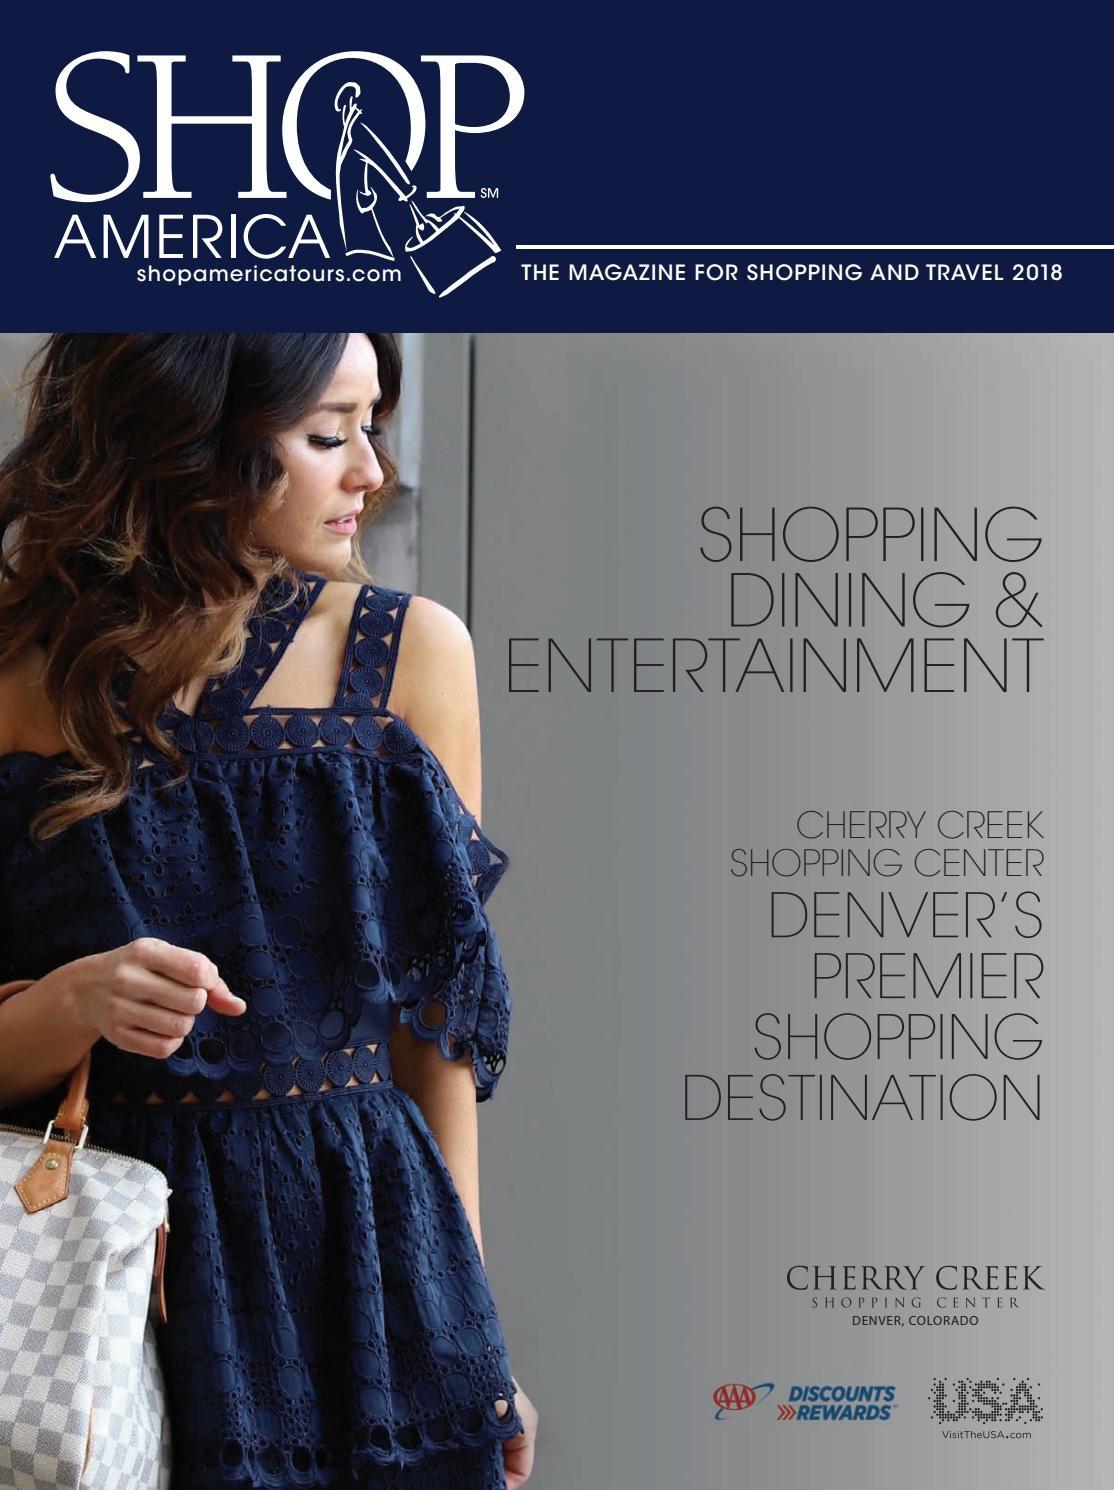 afe3908faf Shop America Magazine 2018 by Tami Whiteside - issuu